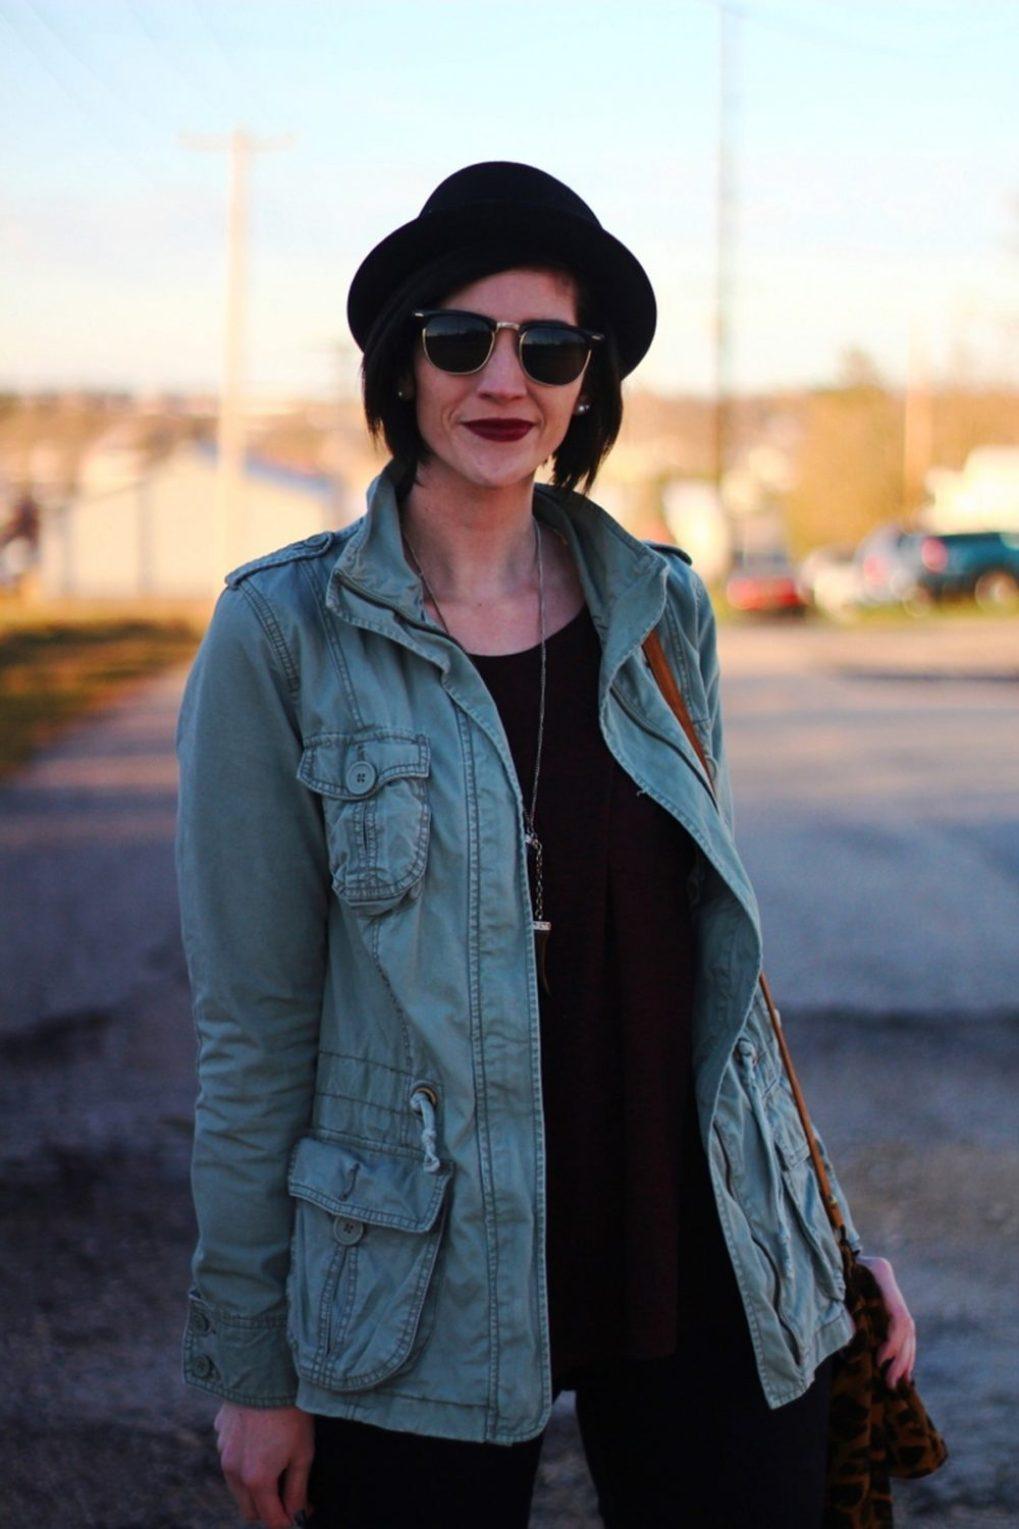 Outfit: burgundy top, burgundy lipstick, olive colored jacket, black sunglasses, pork pie hat